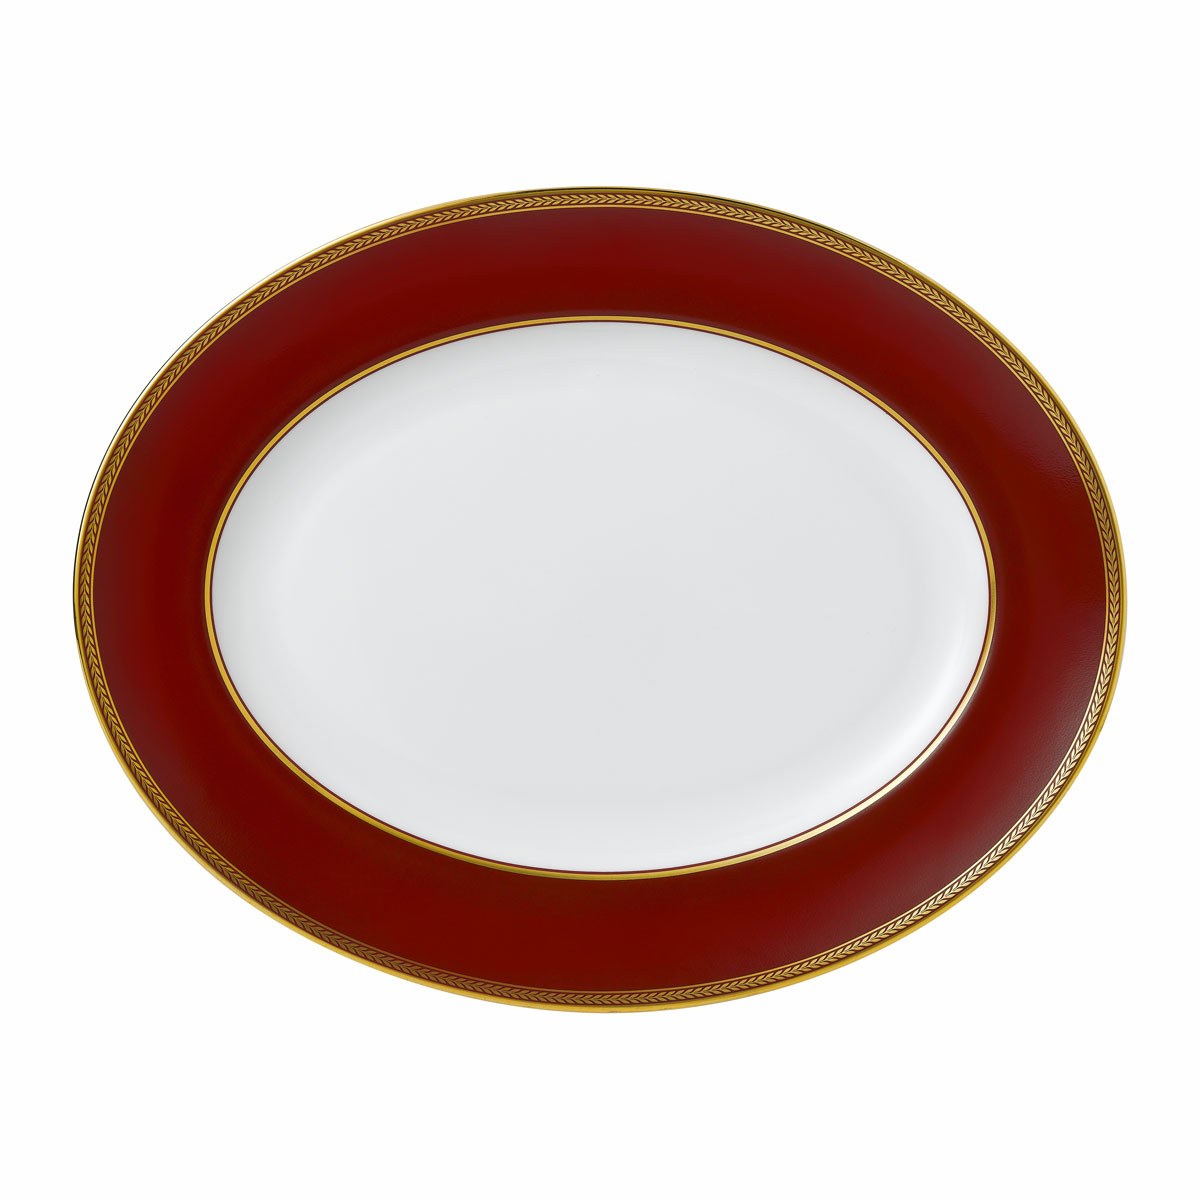 "Wedgwood Renaissance Red Oval Platter 13.8"""